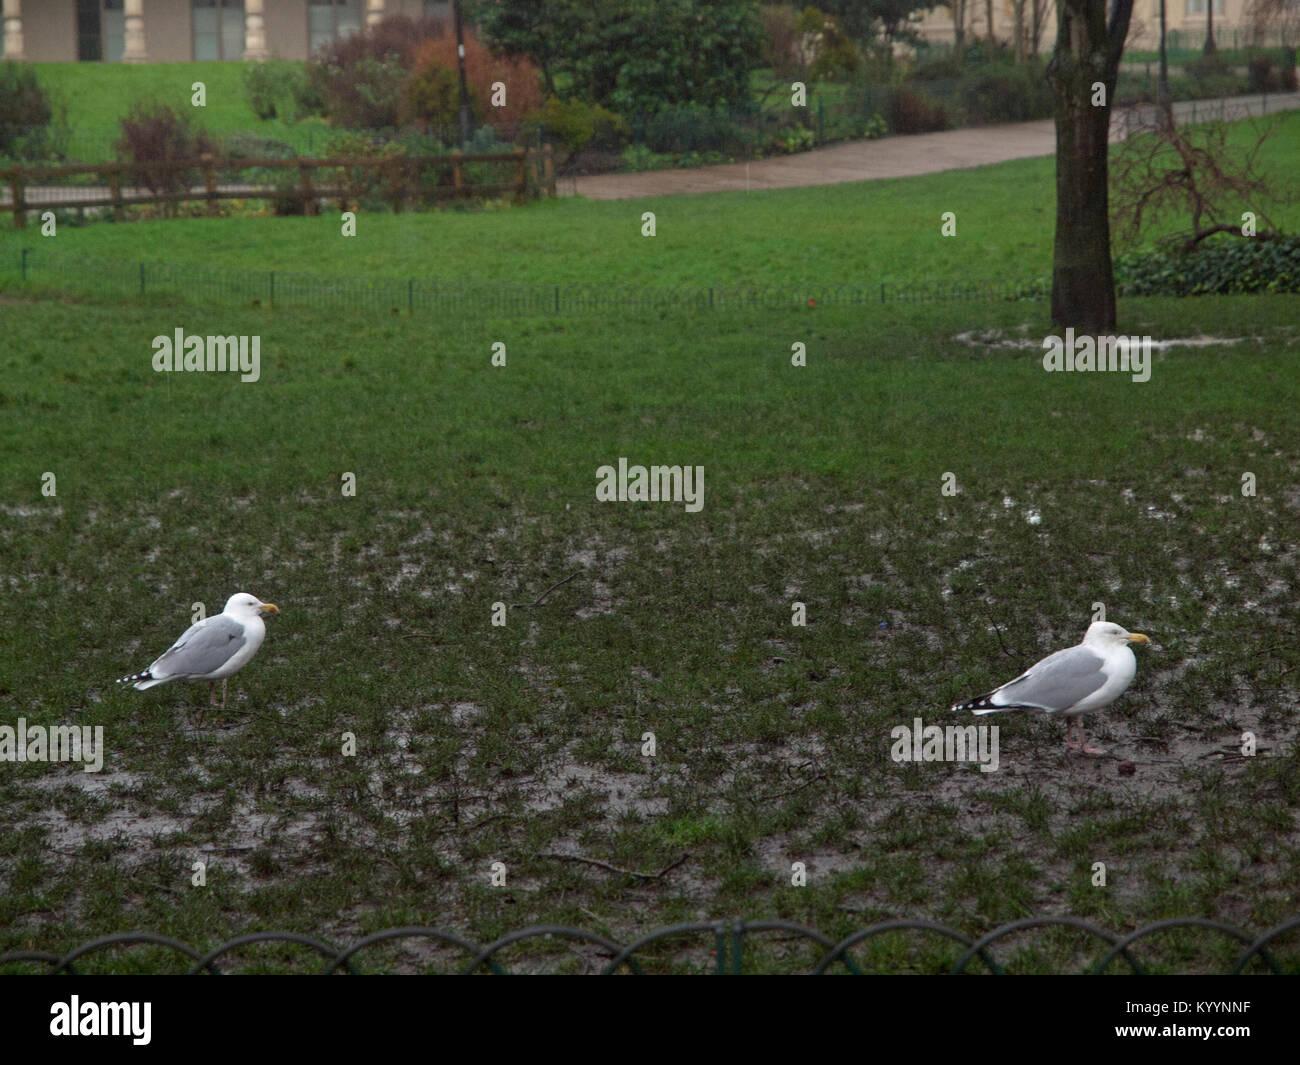 Seagulls In Garden Stock Photos & Seagulls In Garden Stock Images ...